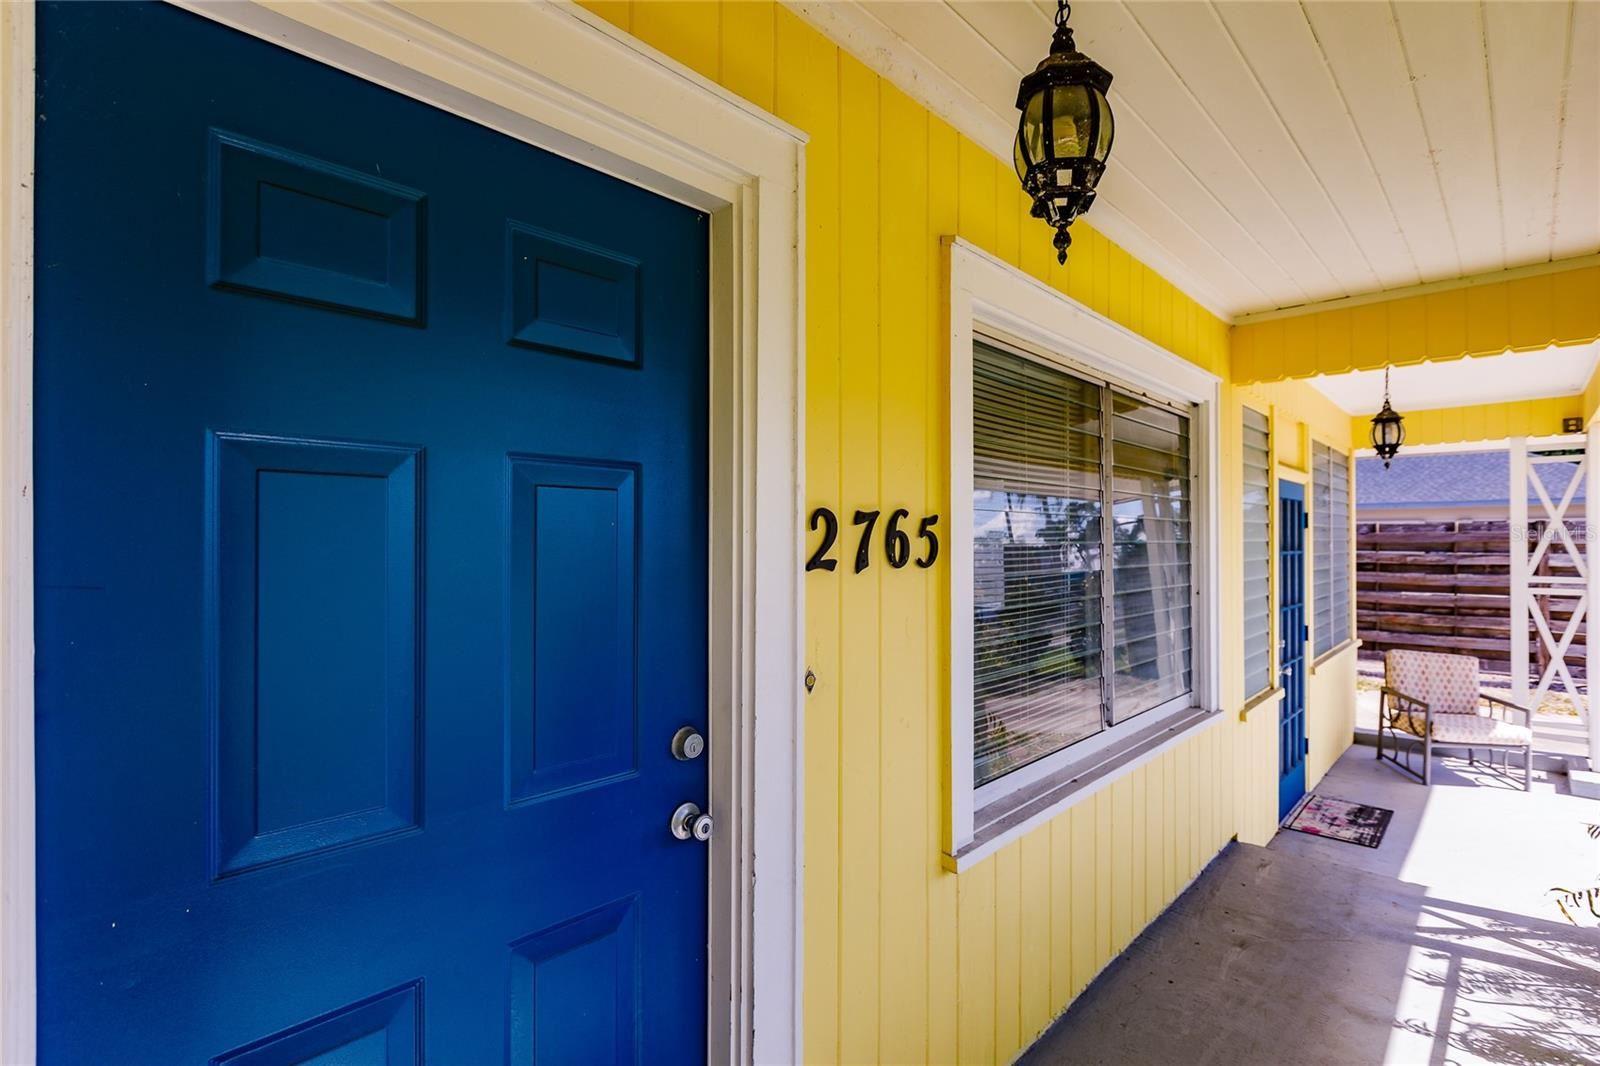 Photo of 2765 RINGLING BOULEVARD, SARASOTA, FL 34237 (MLS # A4505444)